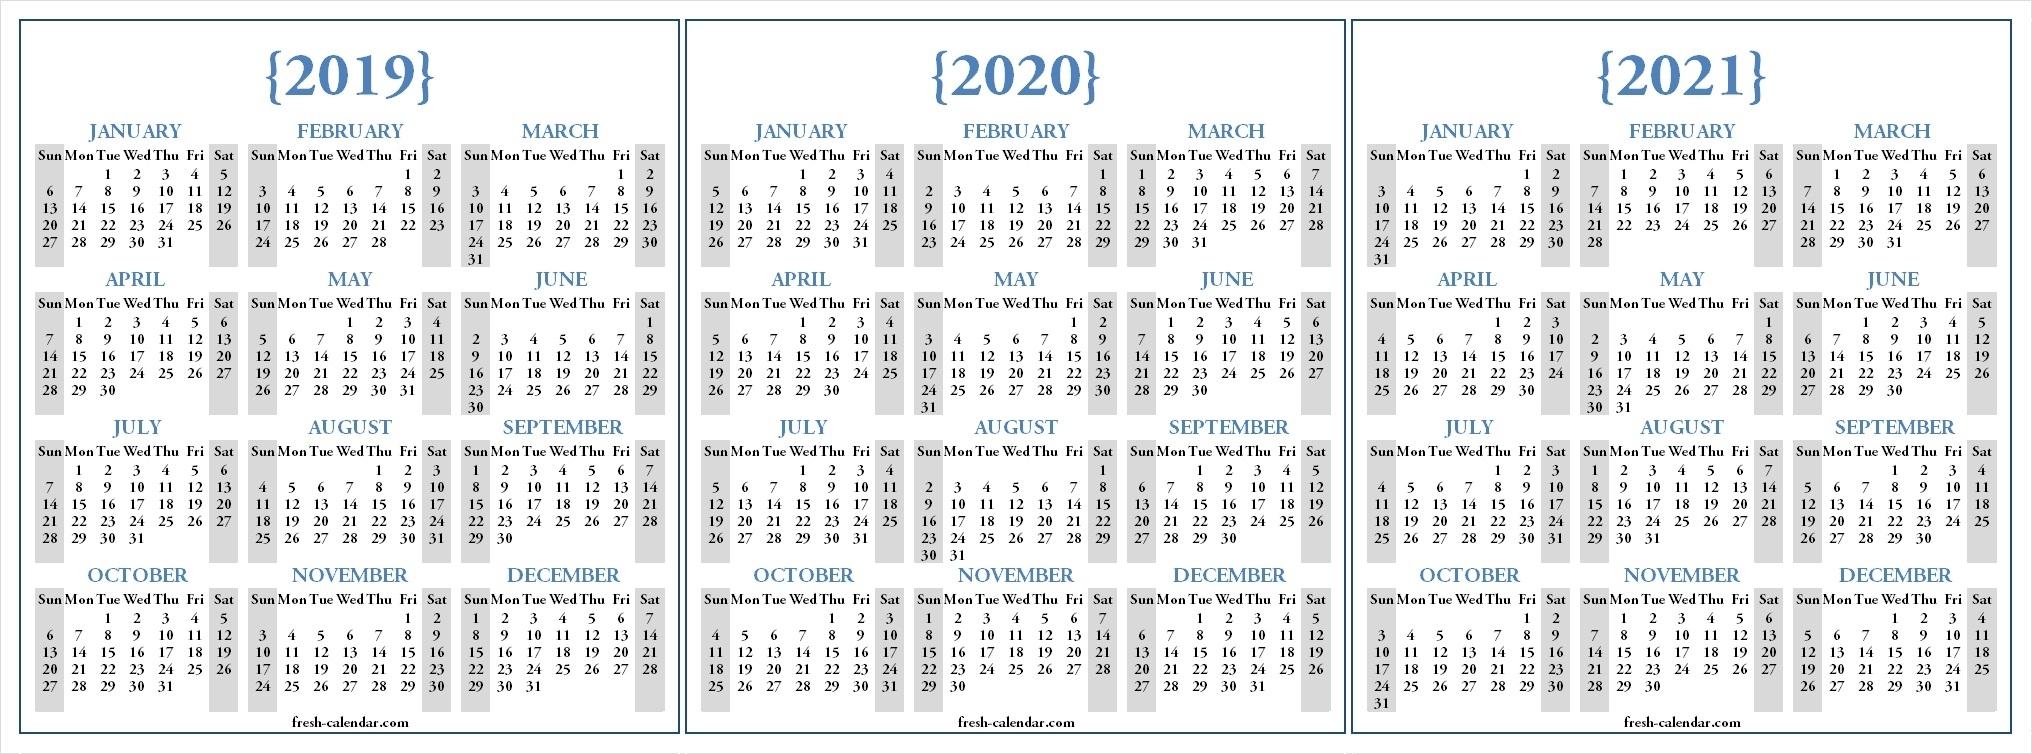 Three Yearly 2019 2020 2021 Calendar Printable Free | Blank Template inside 3 Year Calendar 2019 2020 2021